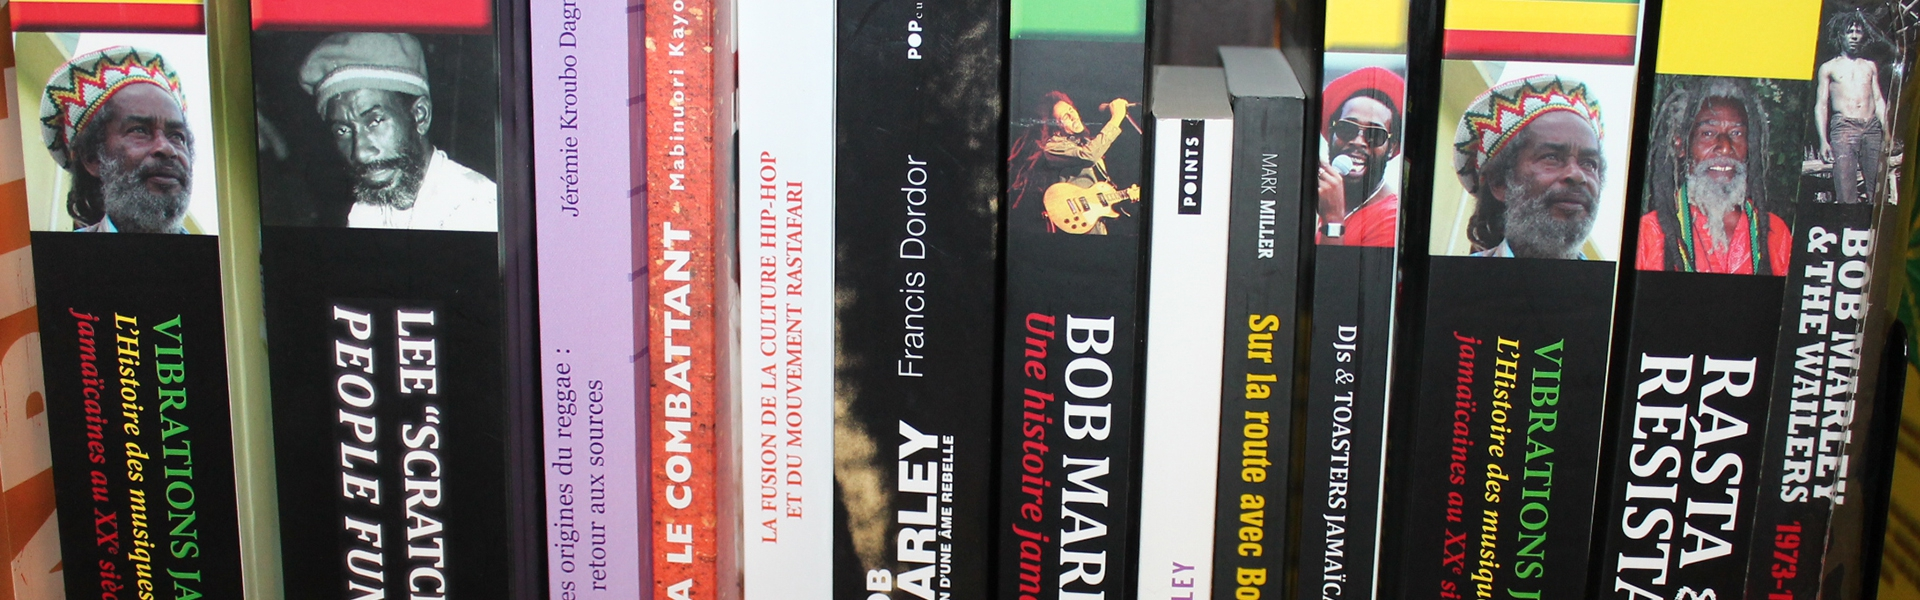 Librairie Rasta, livres Afrique, spiritualité, Rastafari